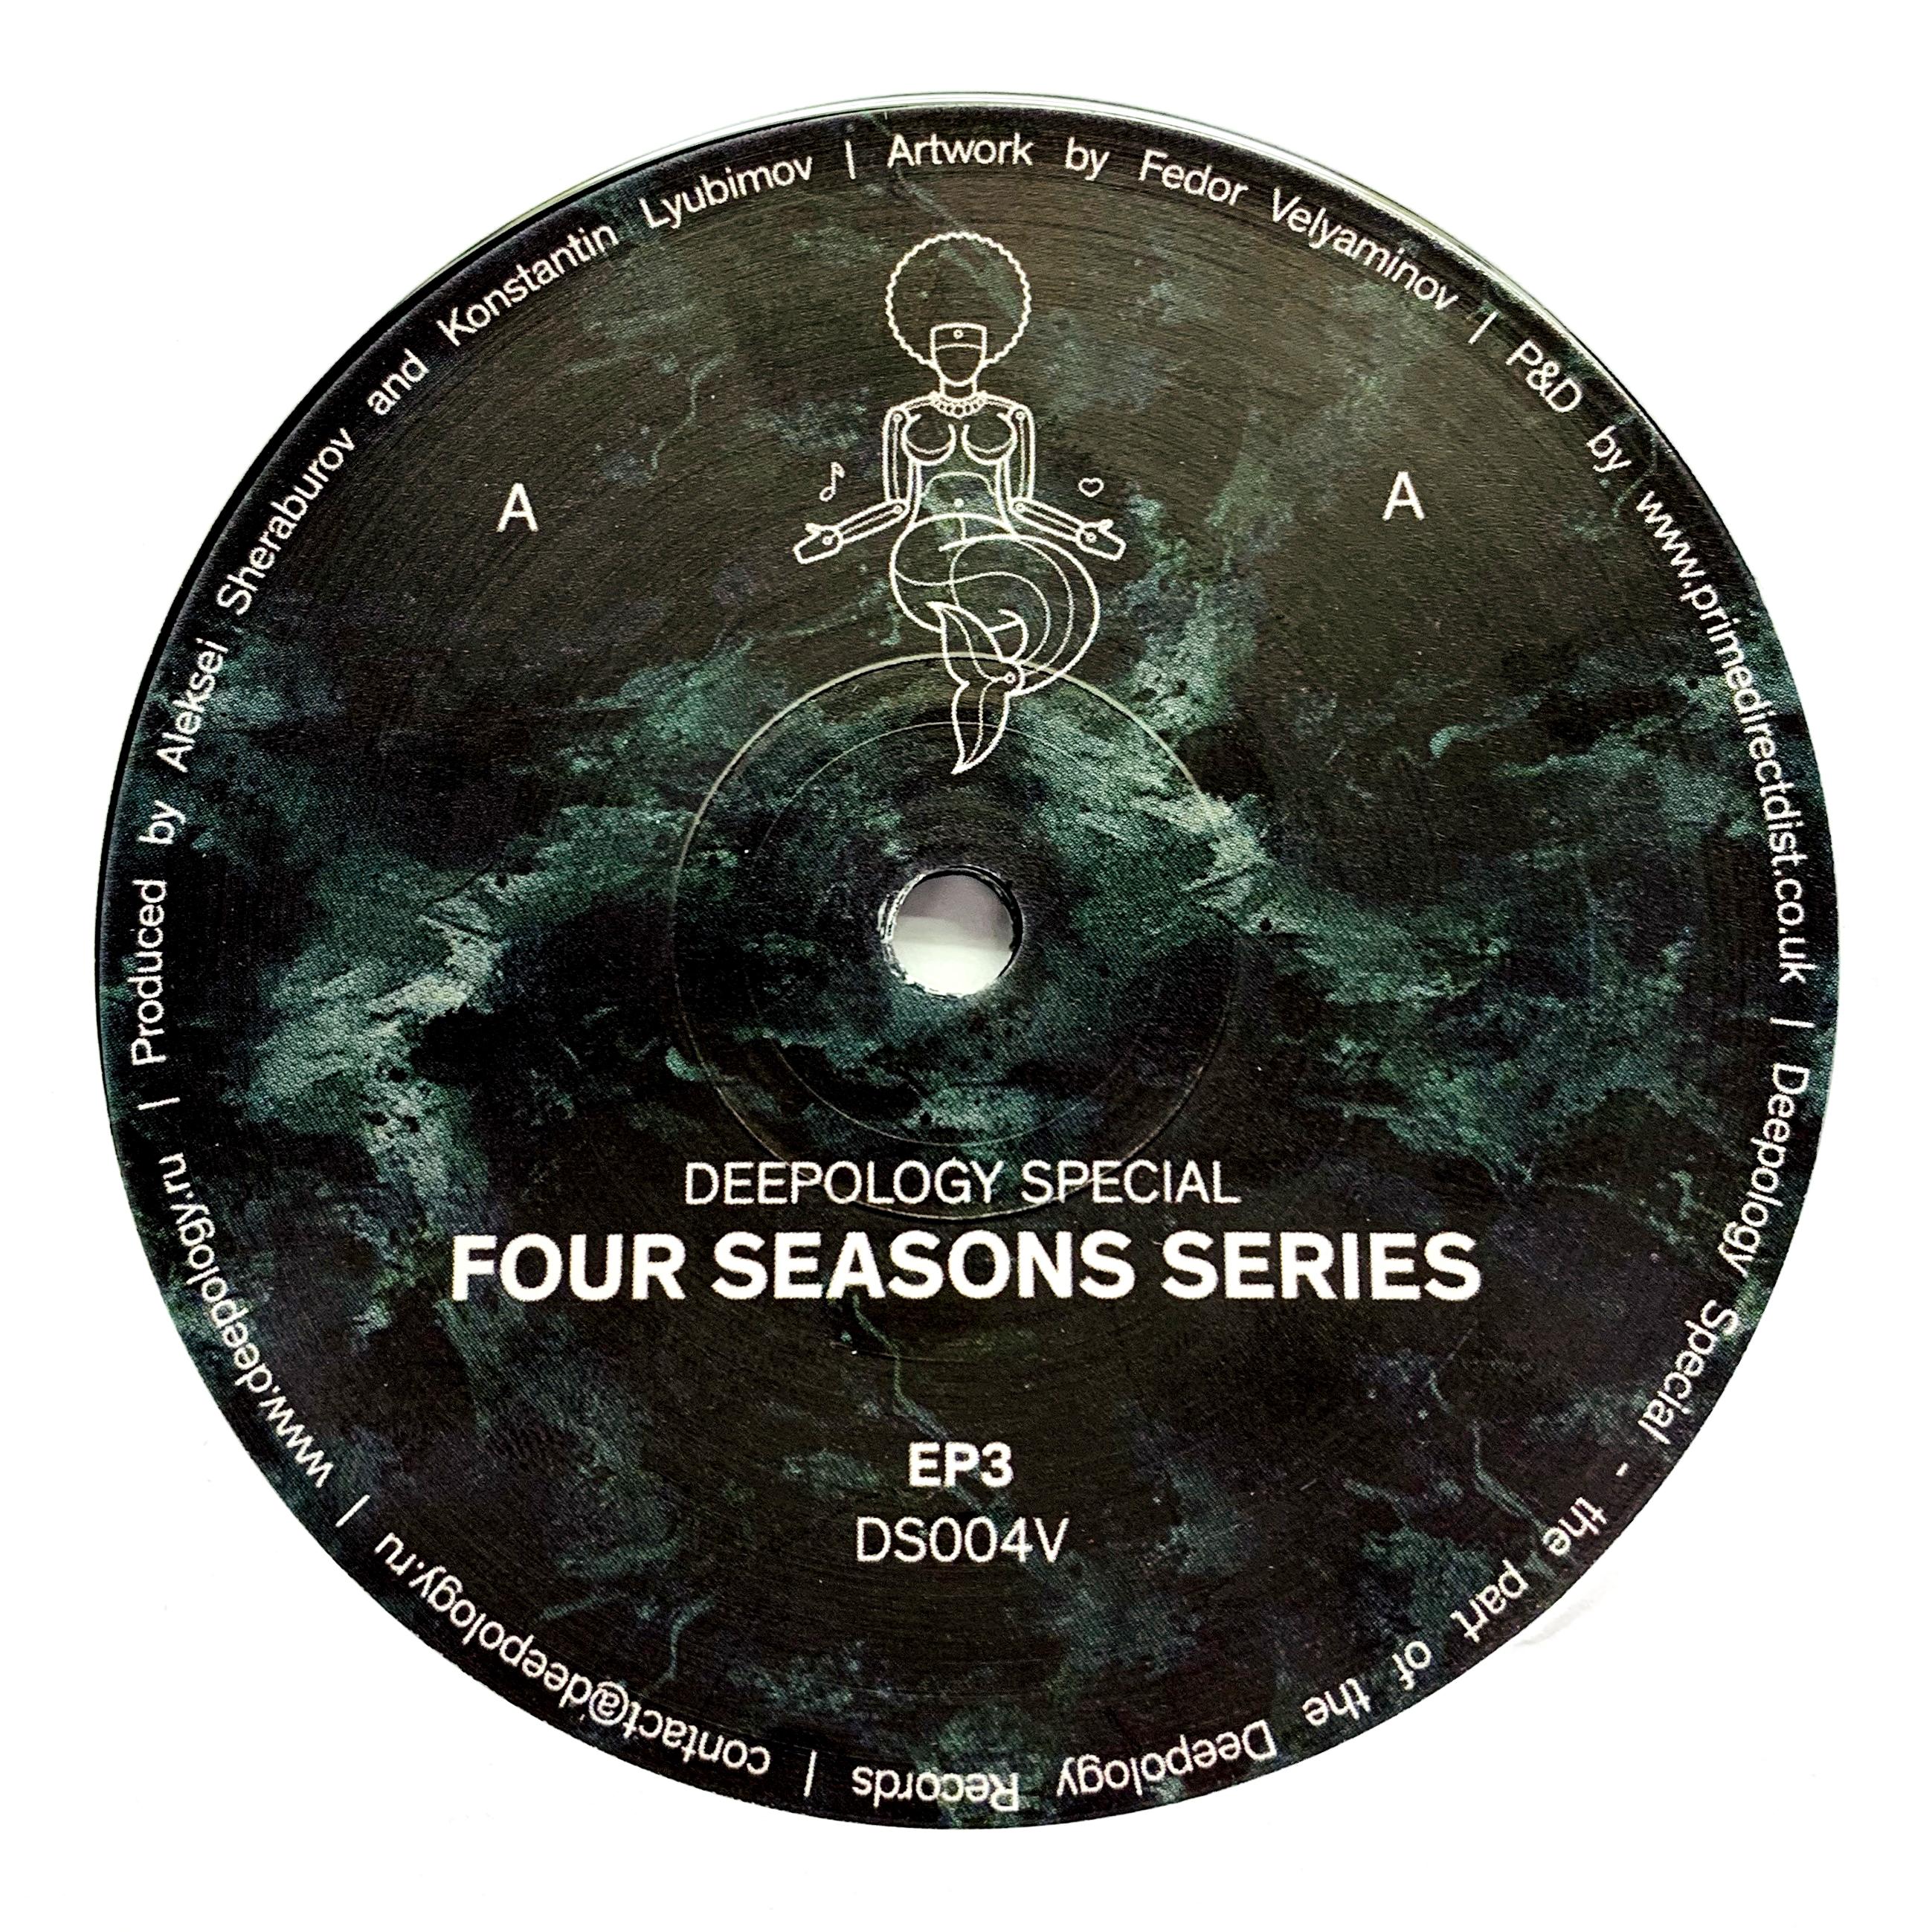 Four Seasons Series EP 3 Image